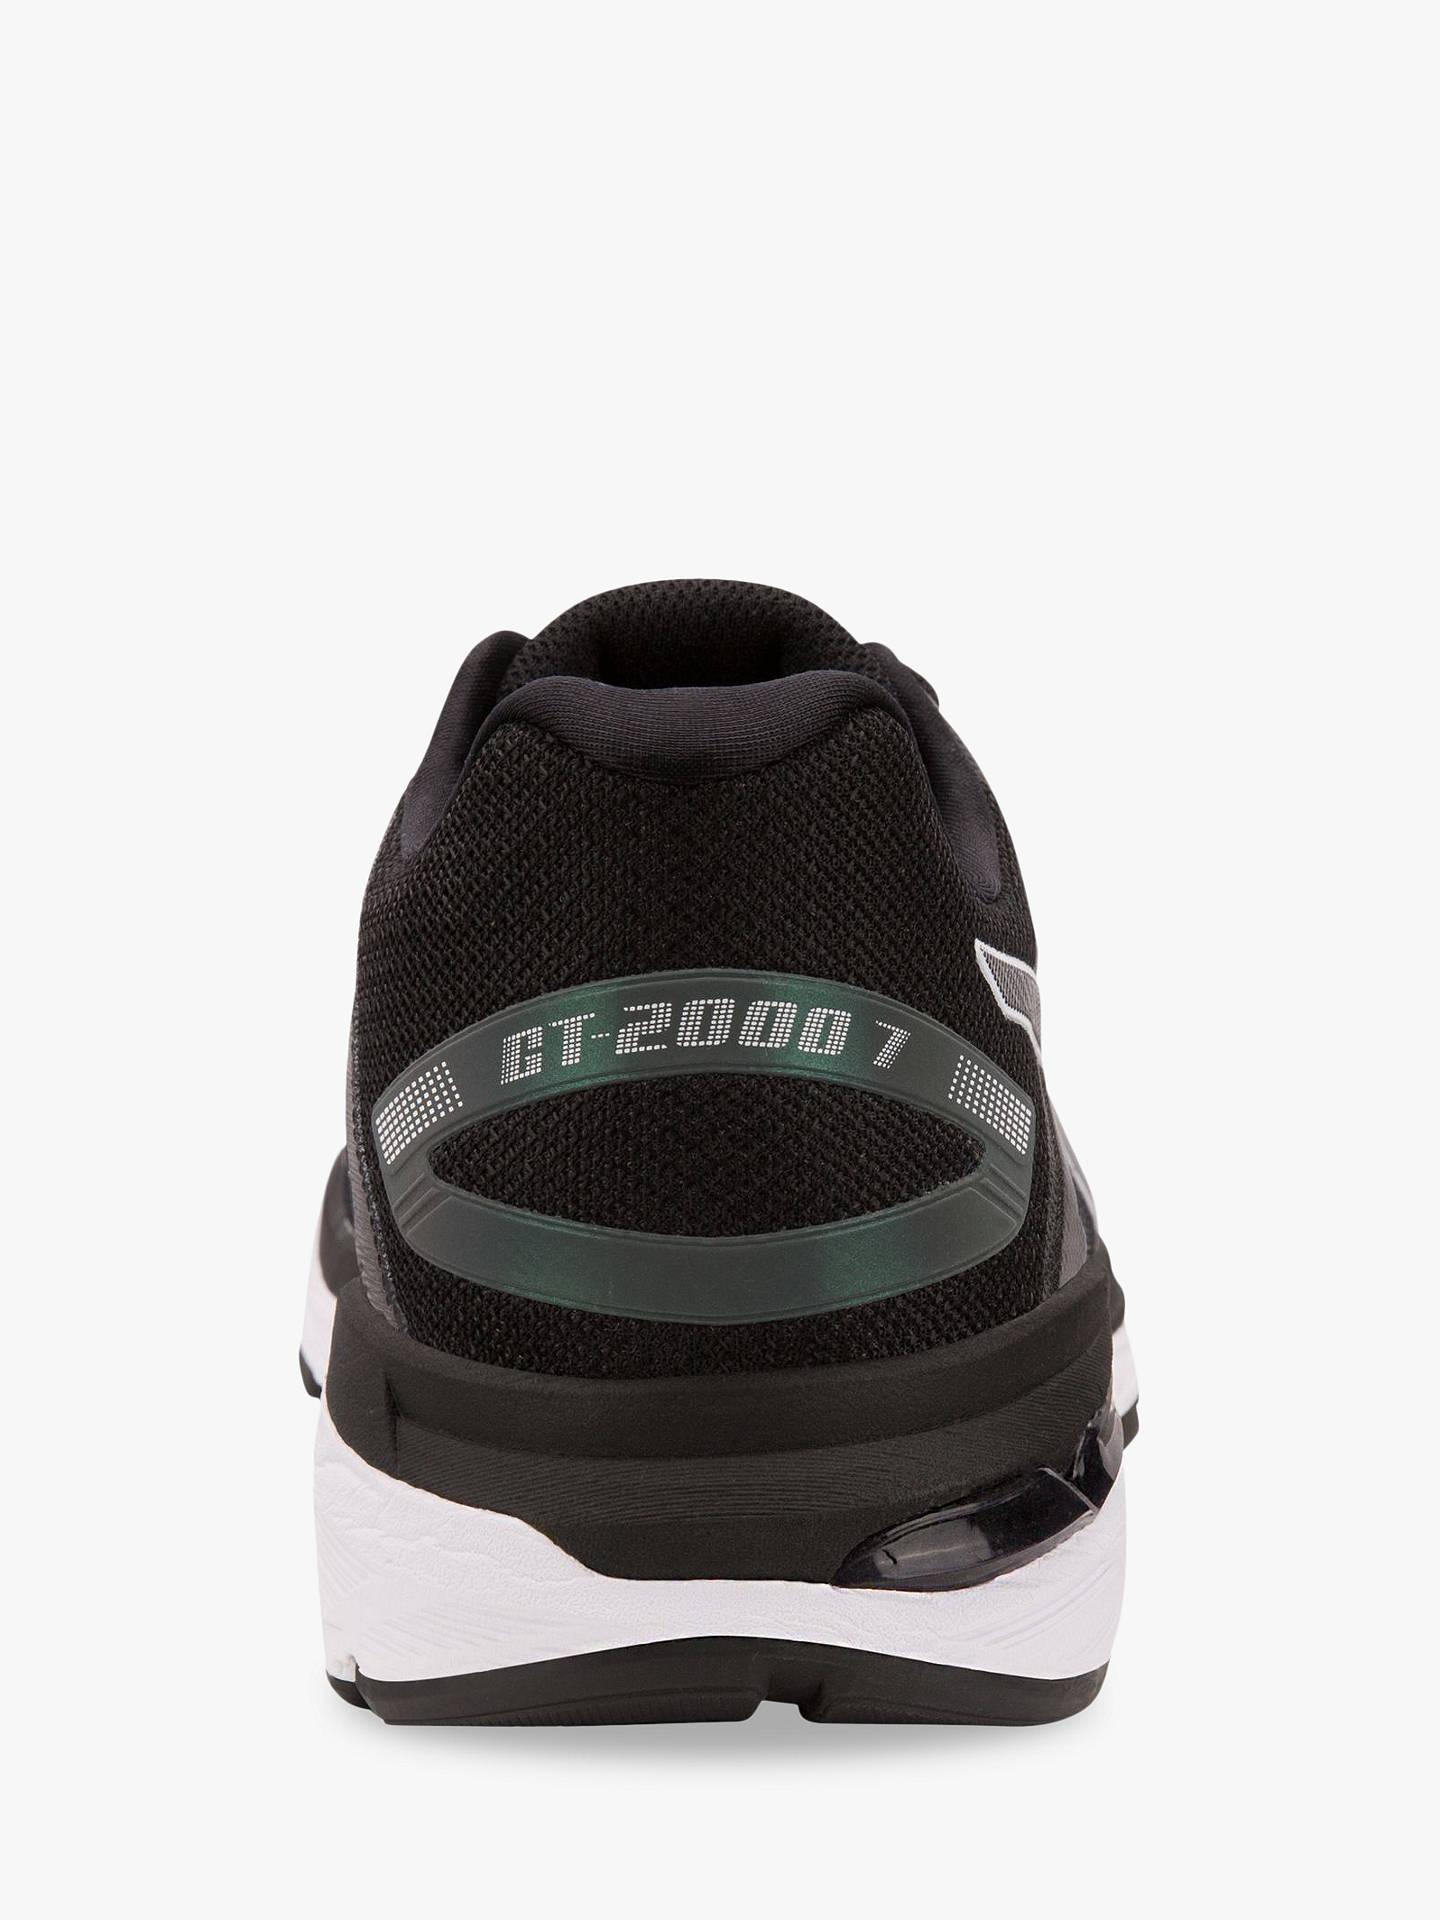 679dbd1a ASICS GT-2000 7 Men's Running Shoes at John Lewis & Partners